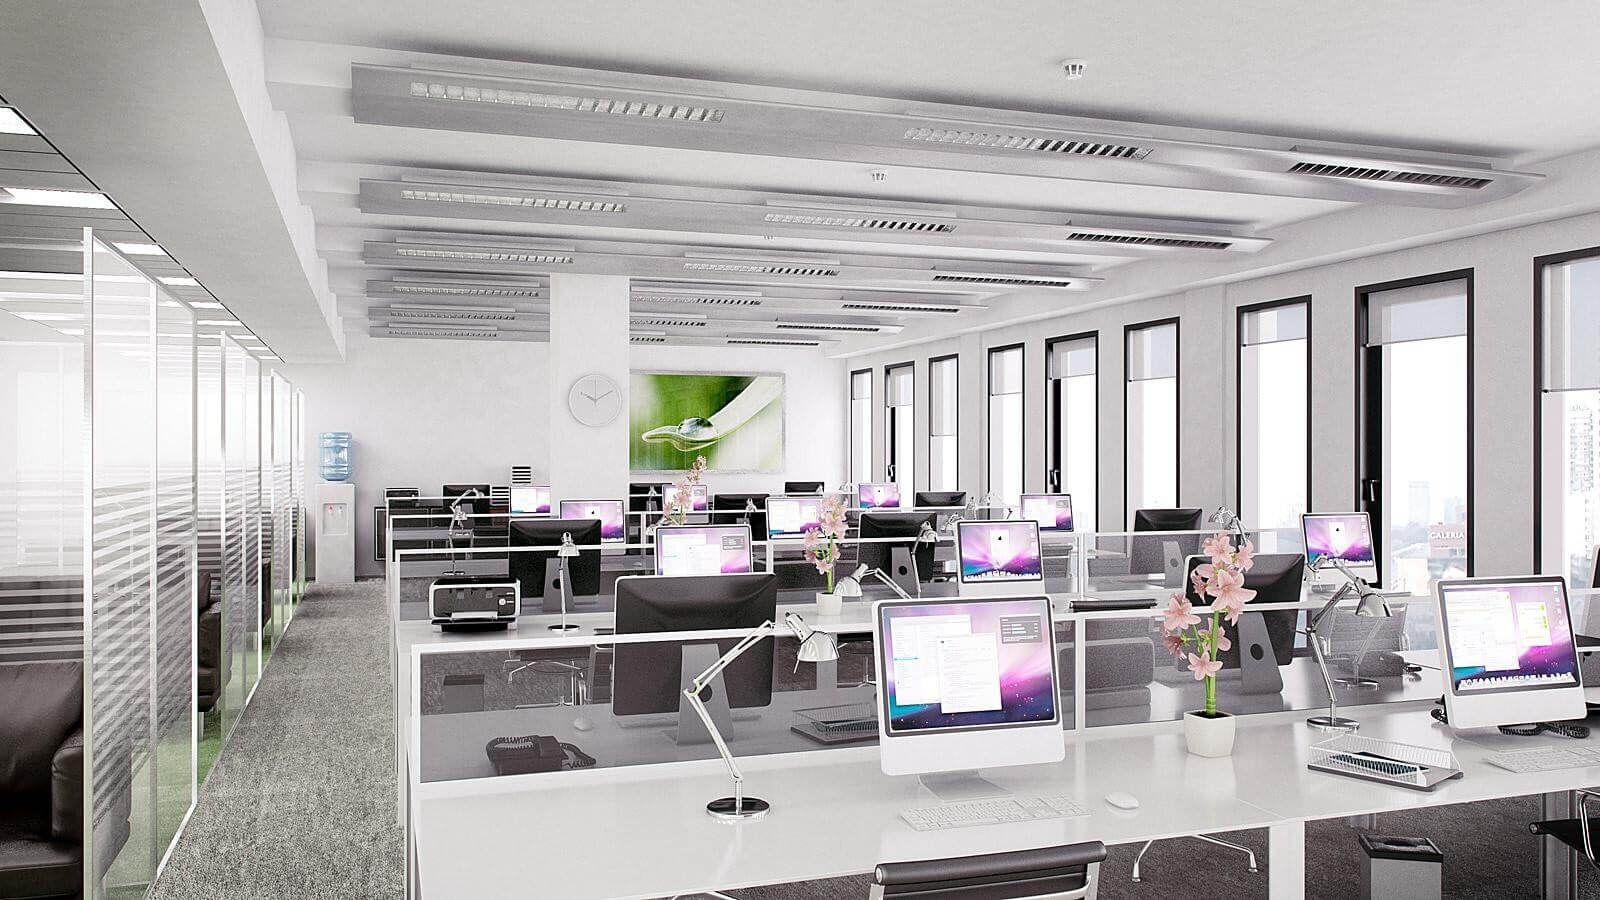 open office ceiling decoration idea. Image Result For Open Office Executives Ceiling Decoration Idea Pinterest